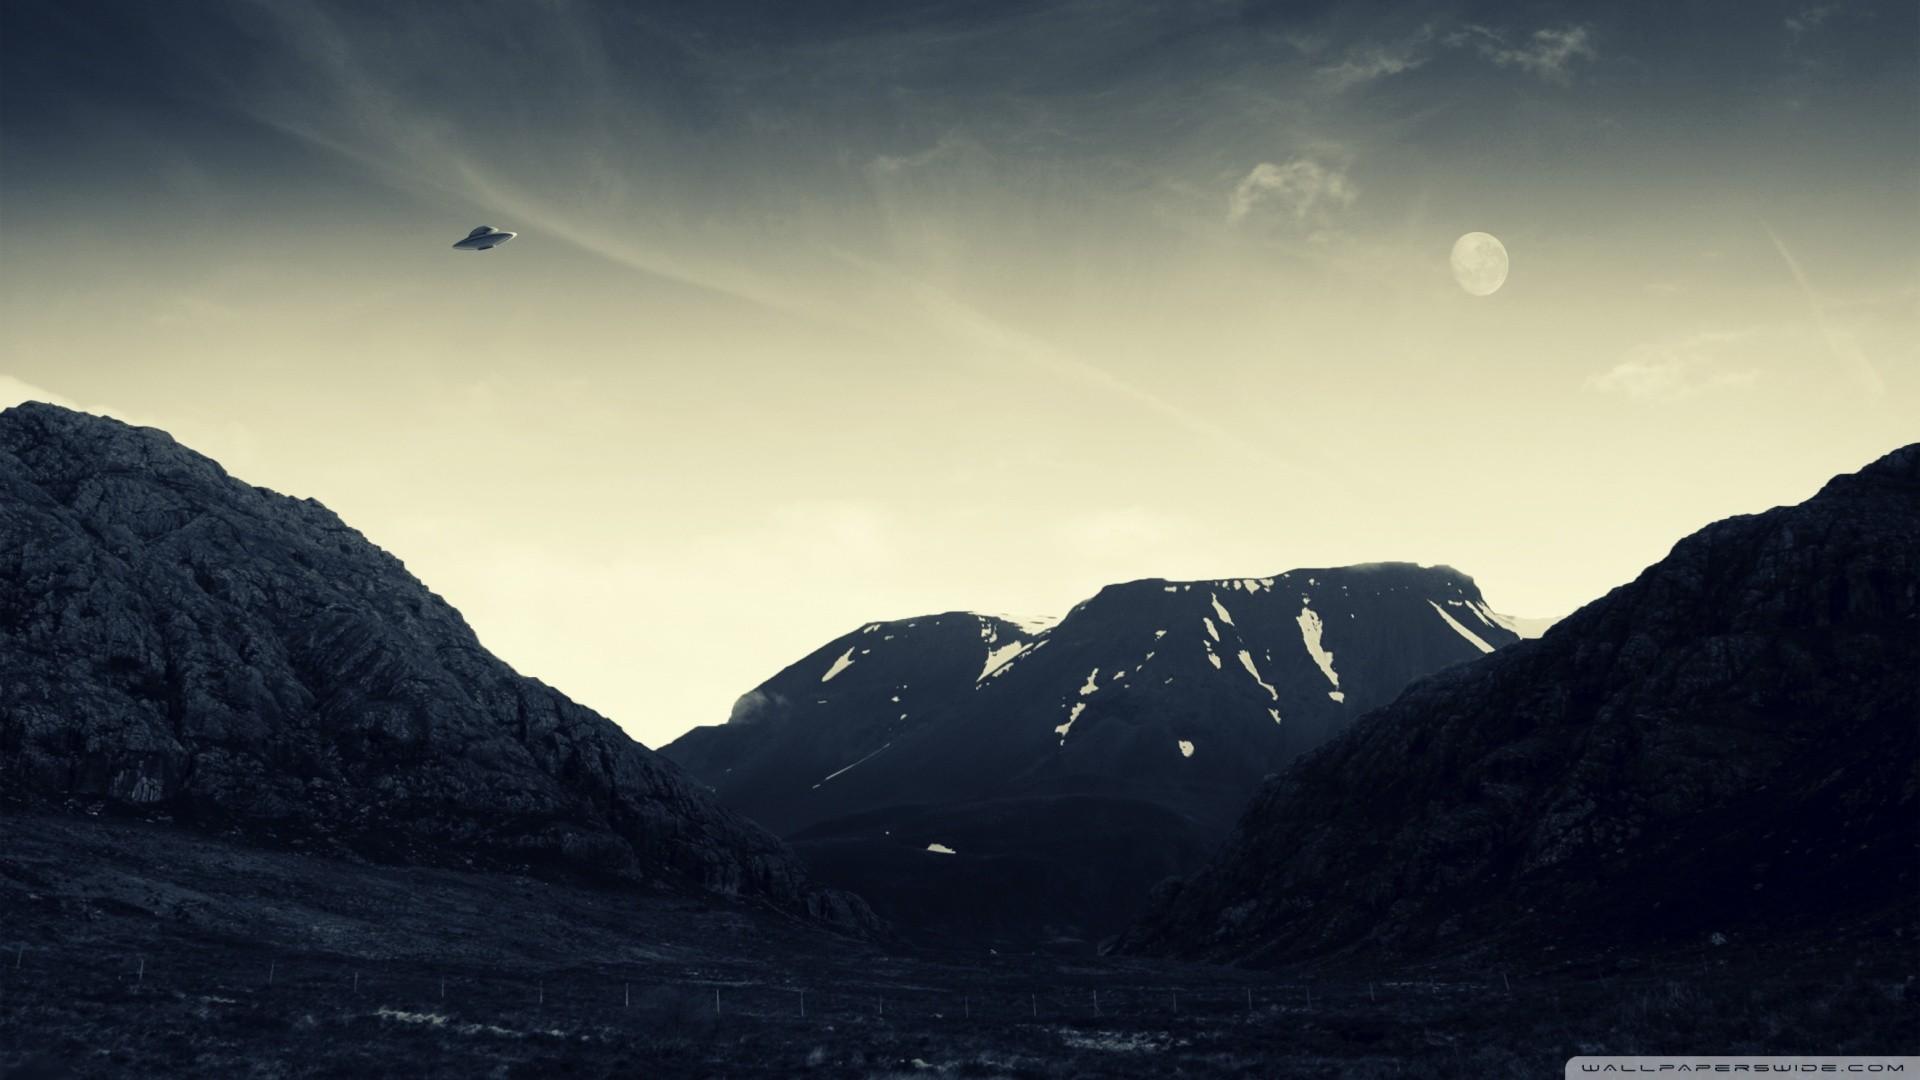 … ufo flying hd desktop wallpaper widescreen high definition …